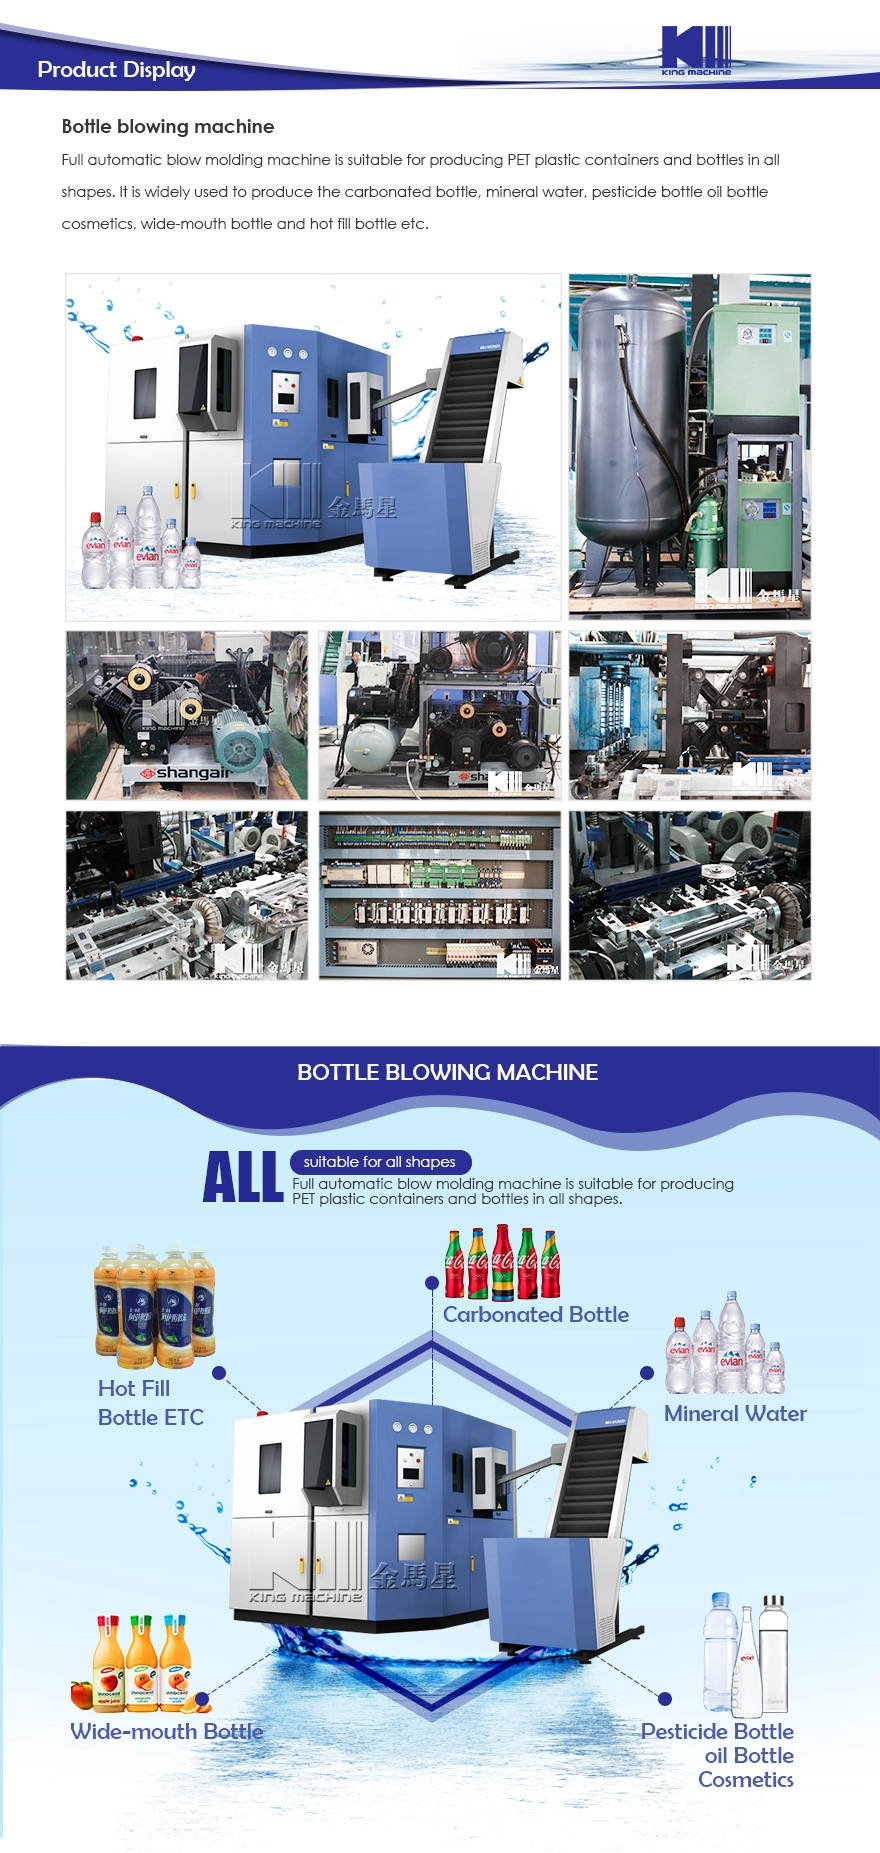 Bottle blowing machine.jpg